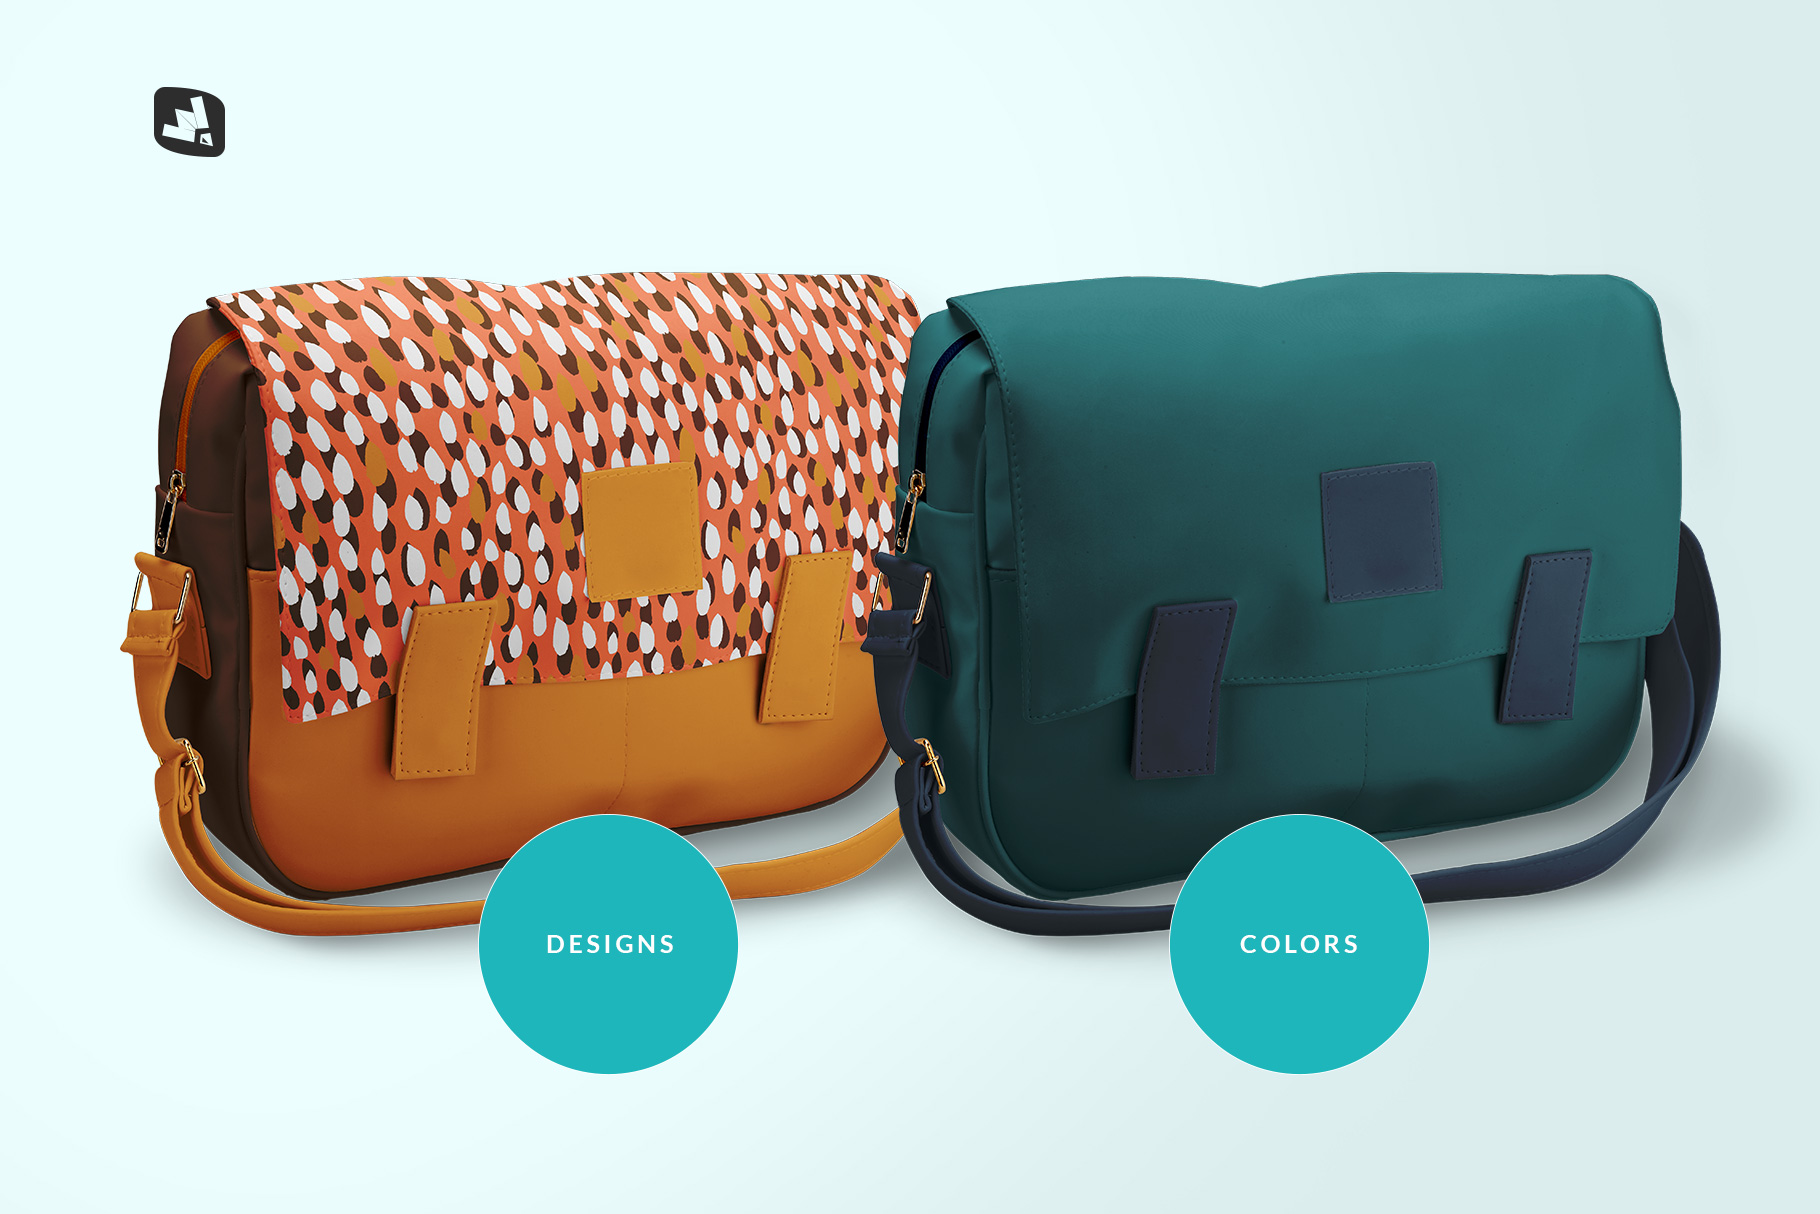 types of the leather messenger bag mockup